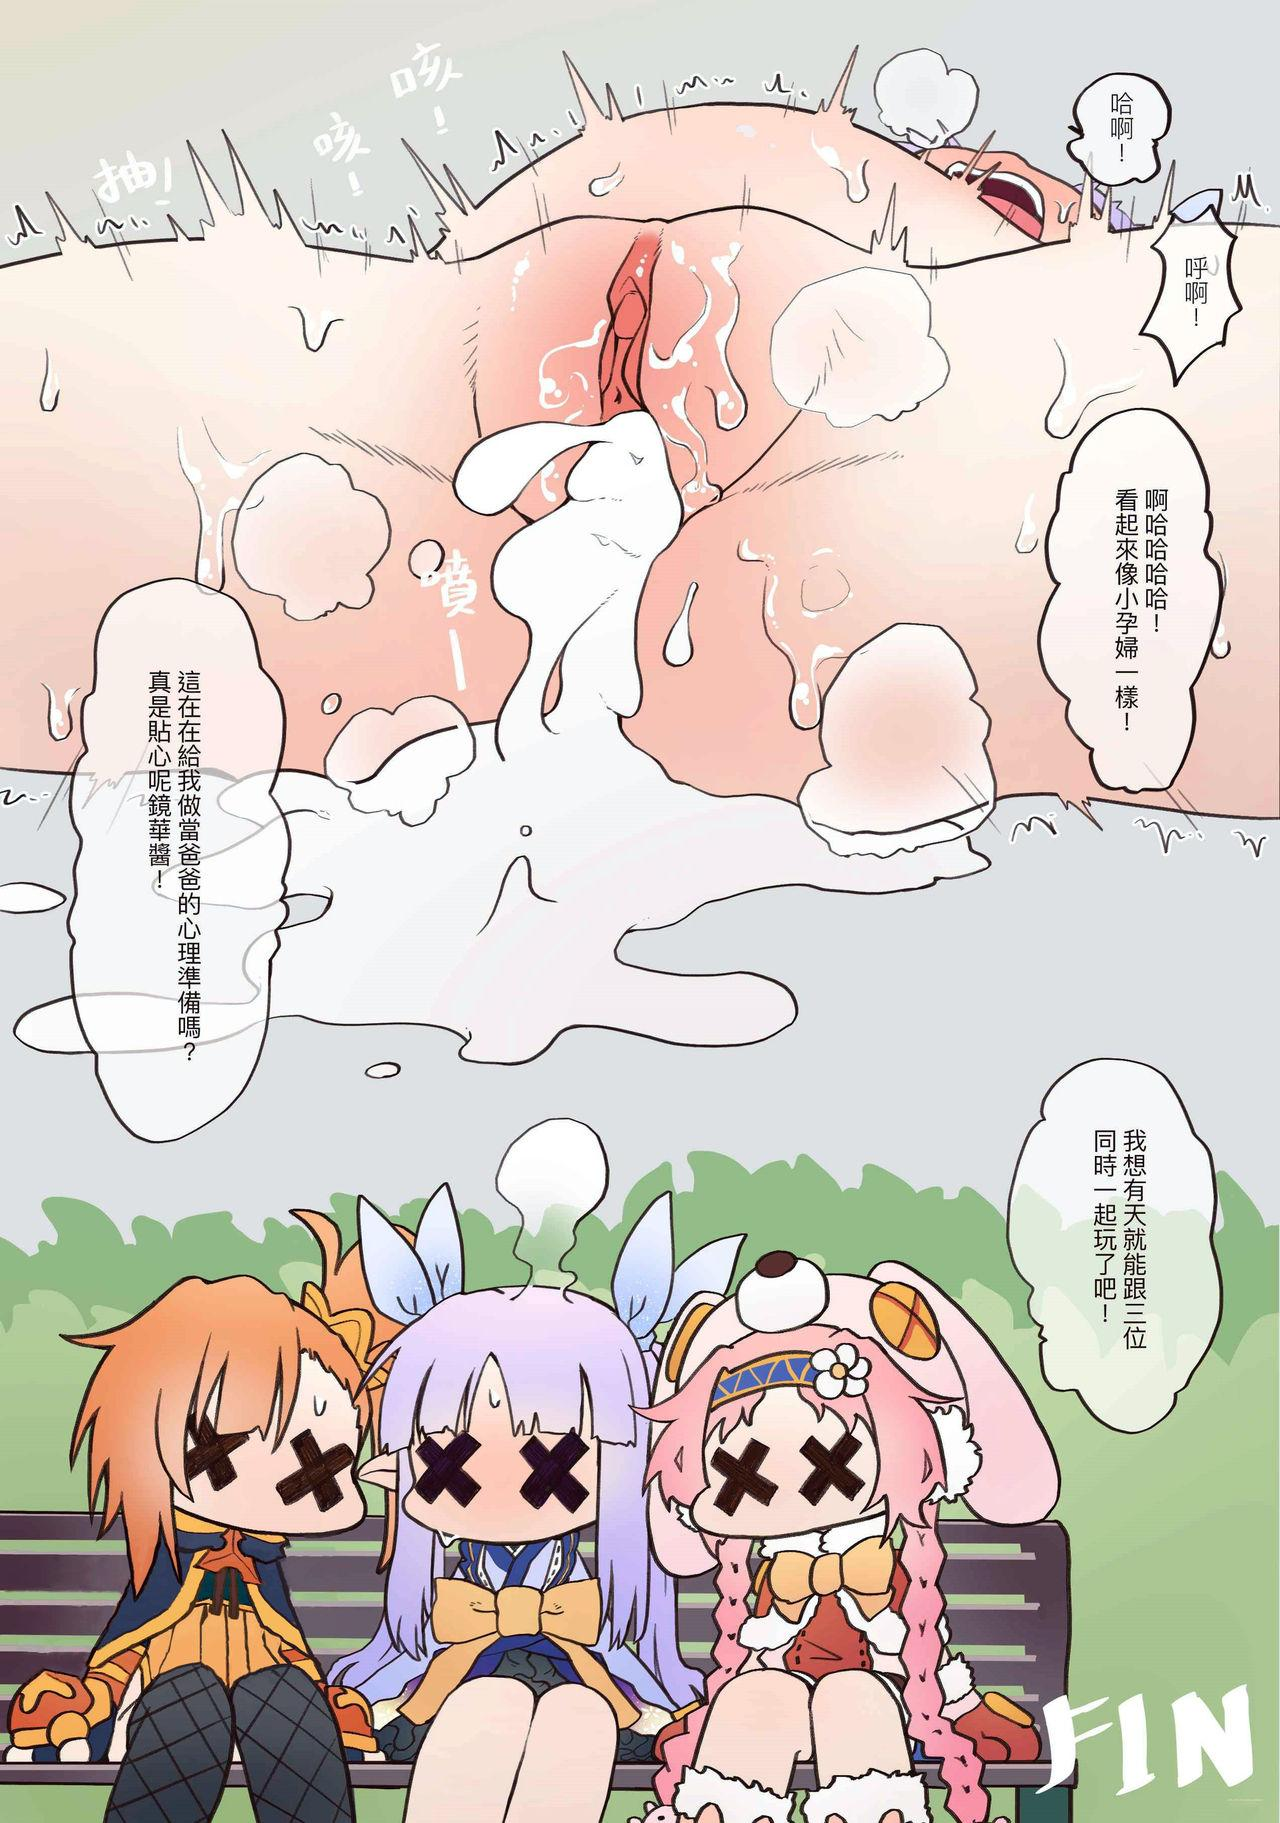 [MountainHan(山含)] Little Lyrical 002 (Princess Connect! Re:Dive) [Chinese] [切嚕系女子個人搬運] [Decensored] +小宣傳 33